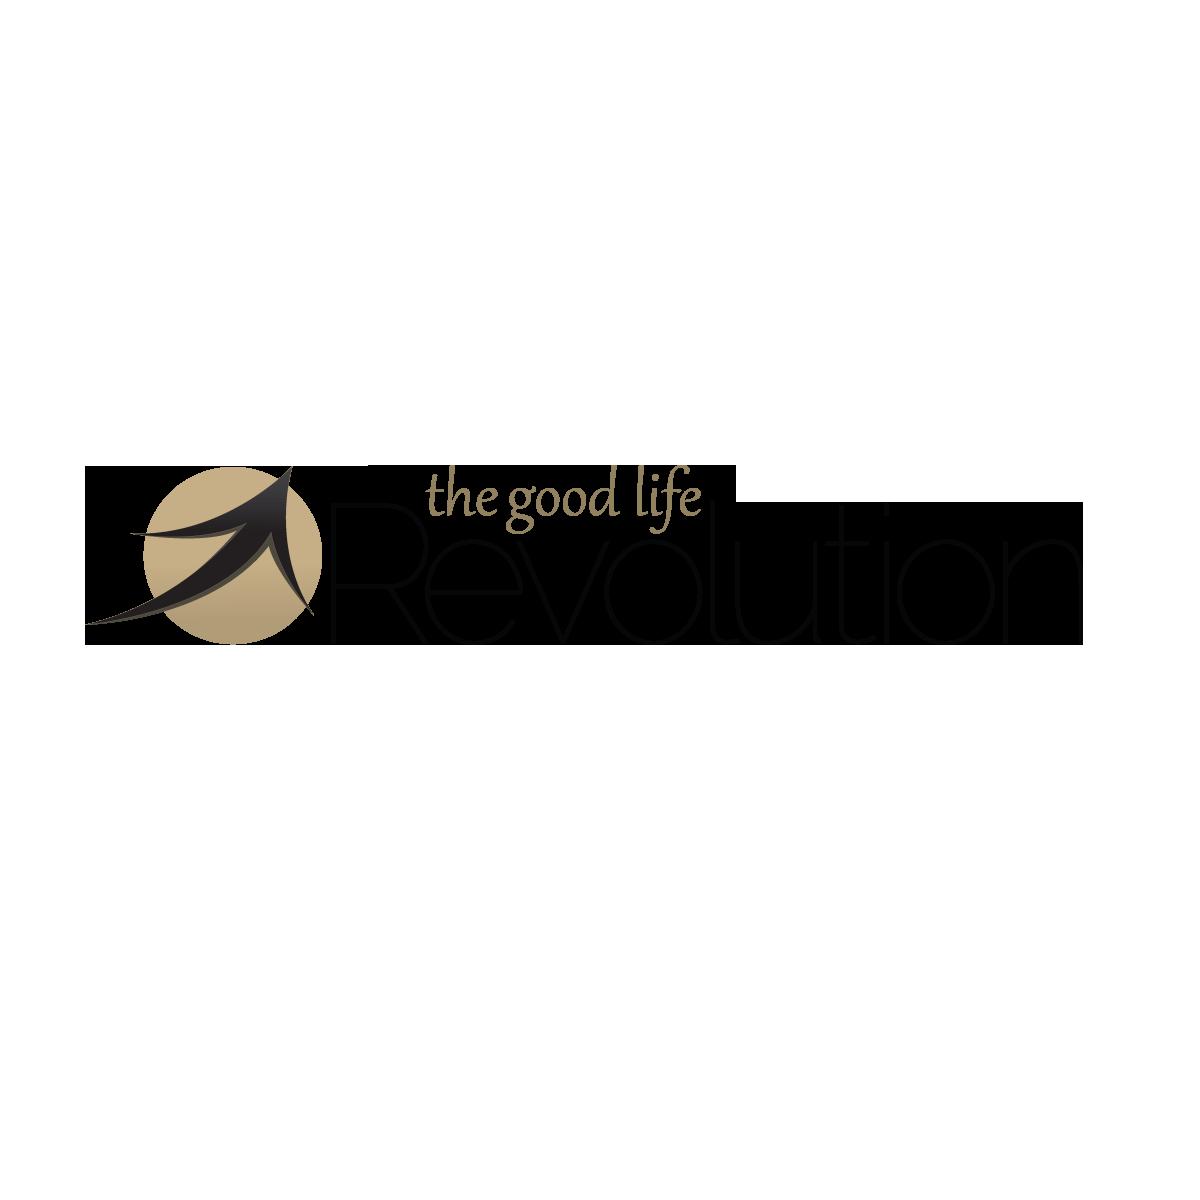 good life revolution brands of the world� download